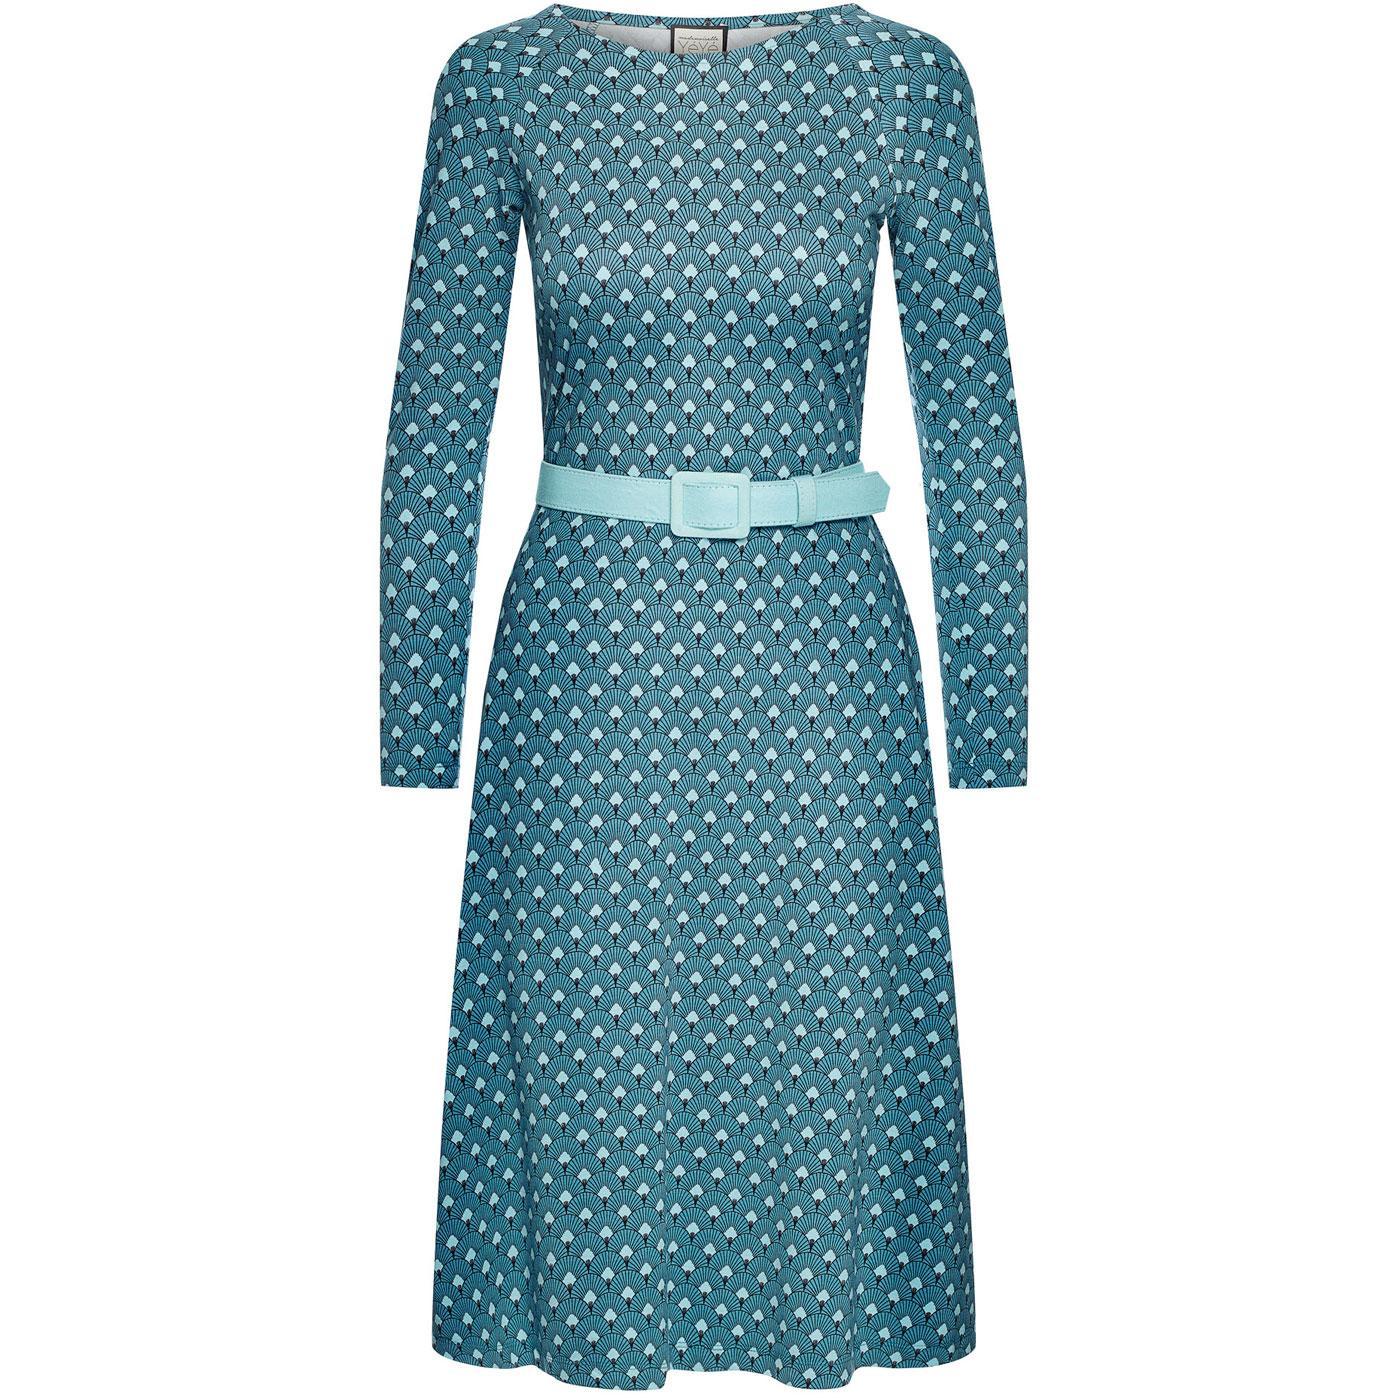 Let The Leaves Dance MADEMOISELLE YEYE 60s Dress